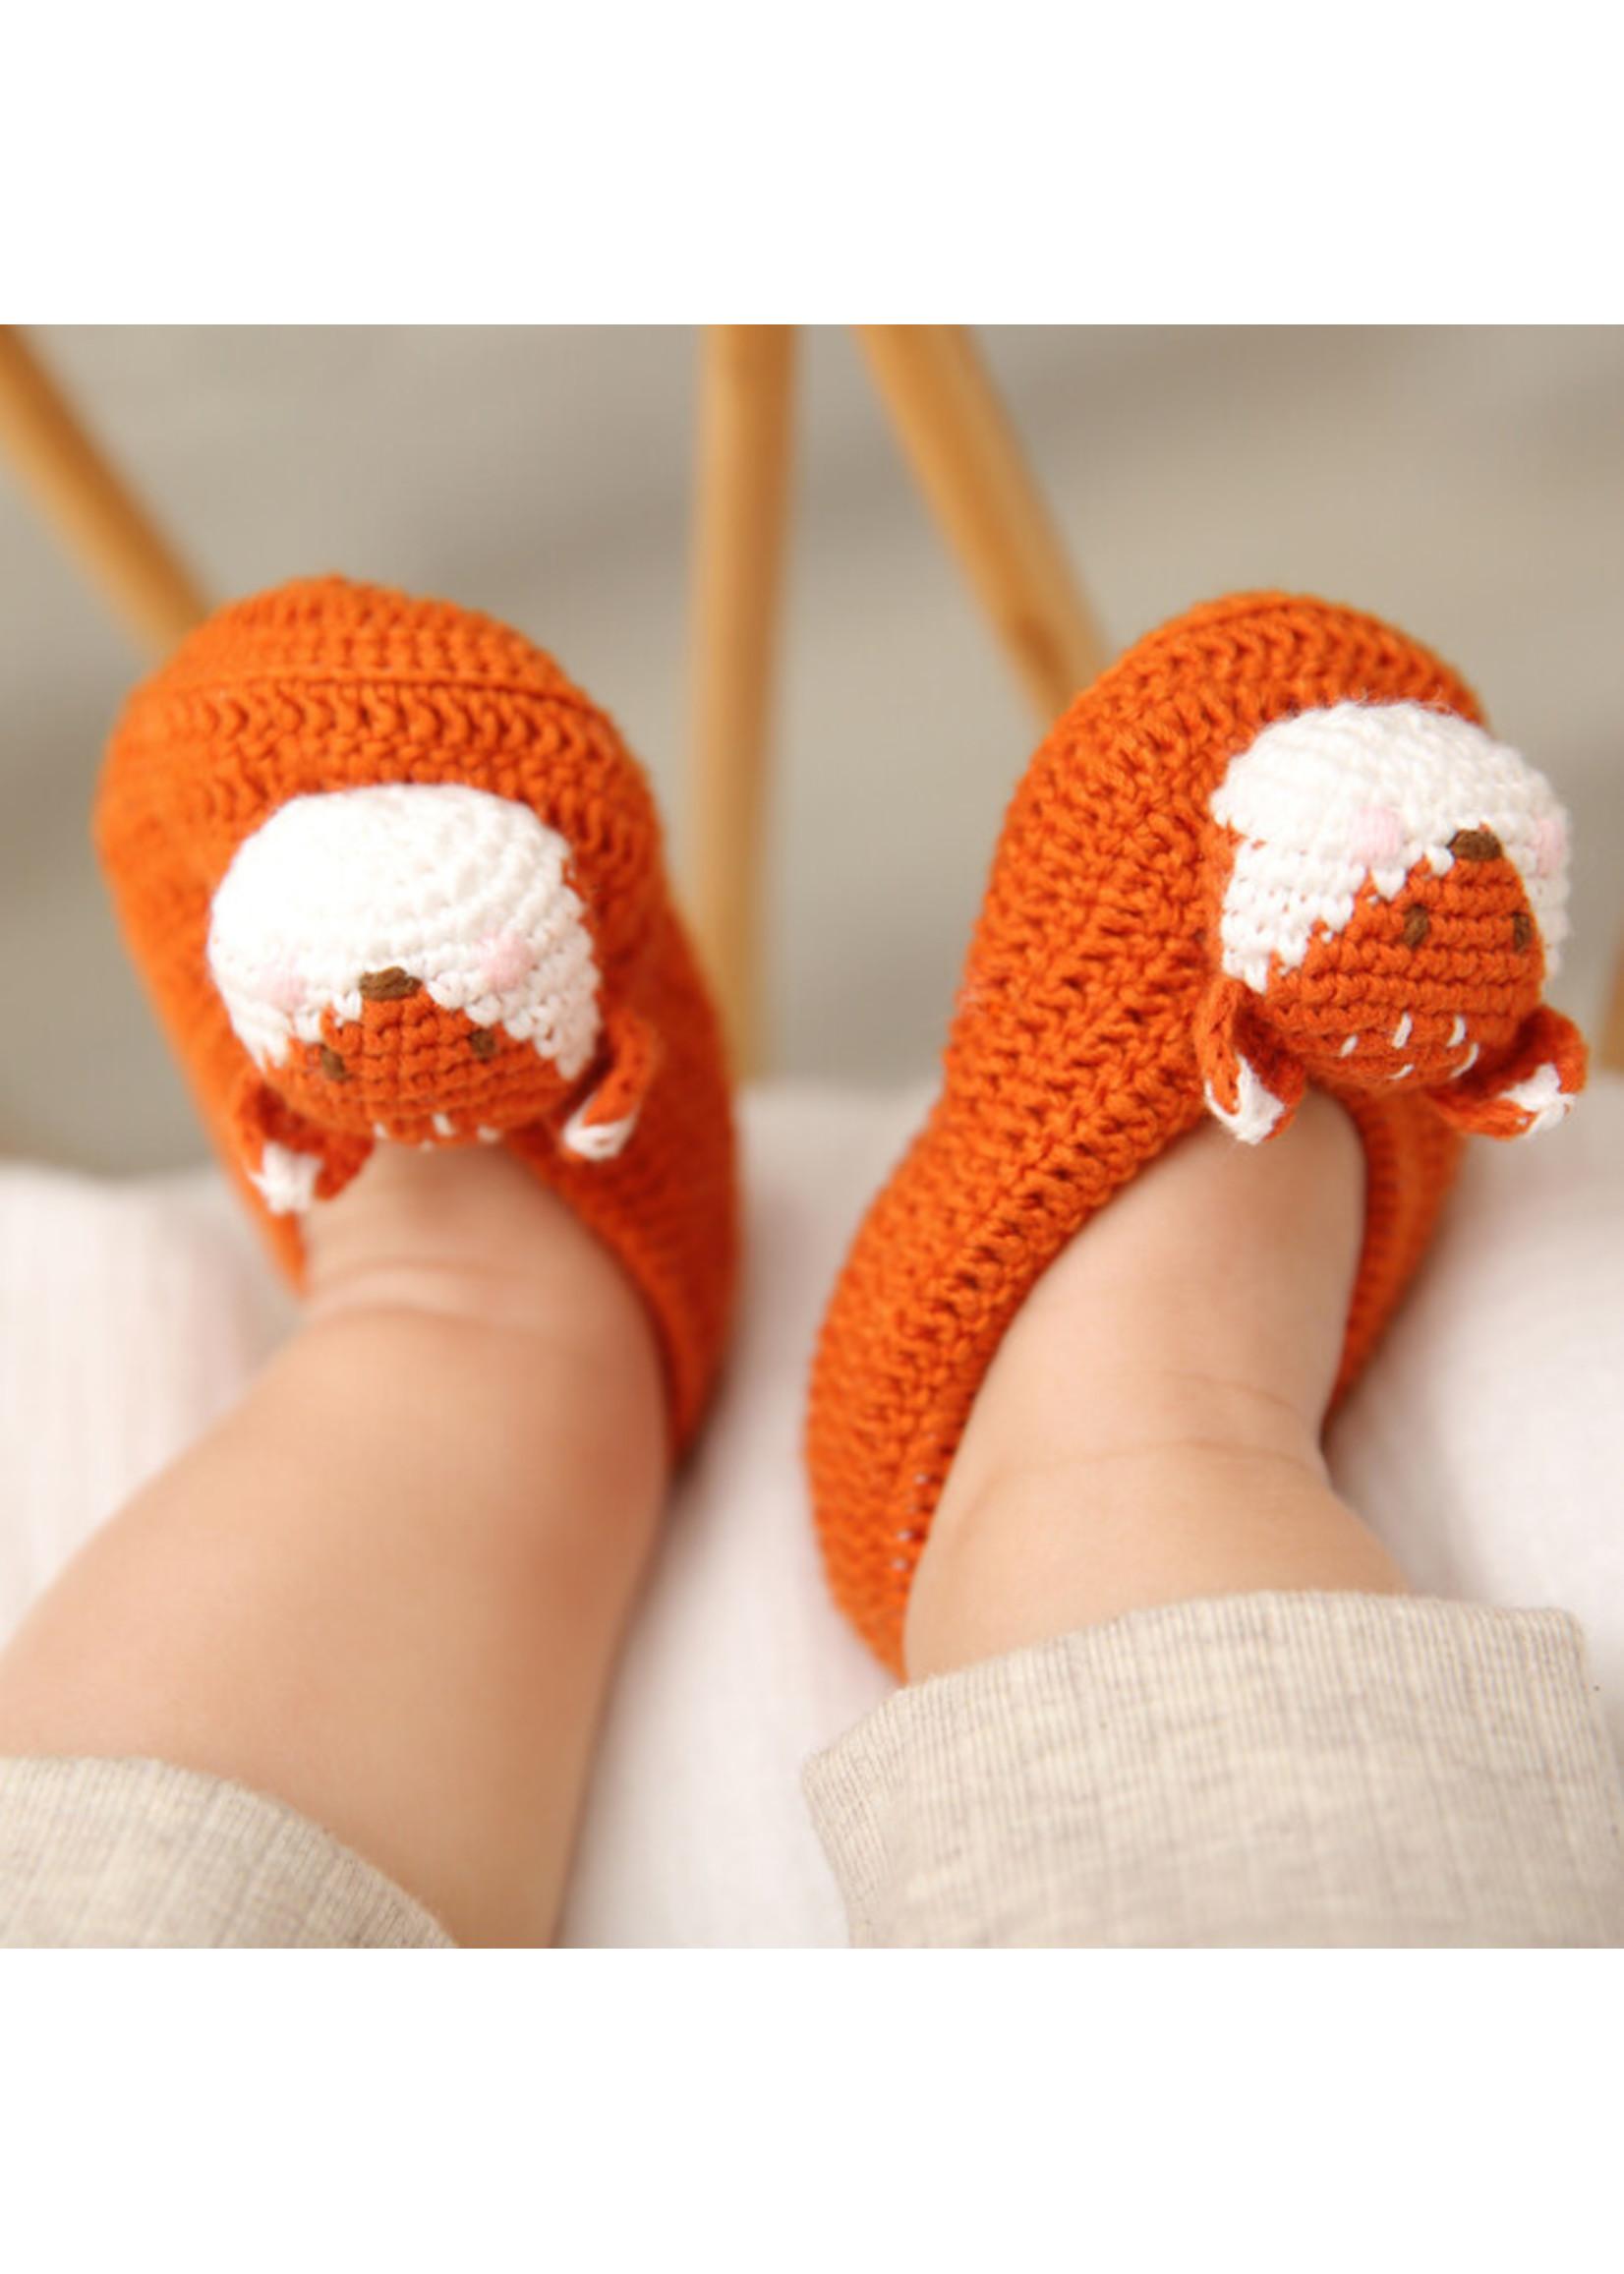 Albetta Albetta Fox Crochet Bootie